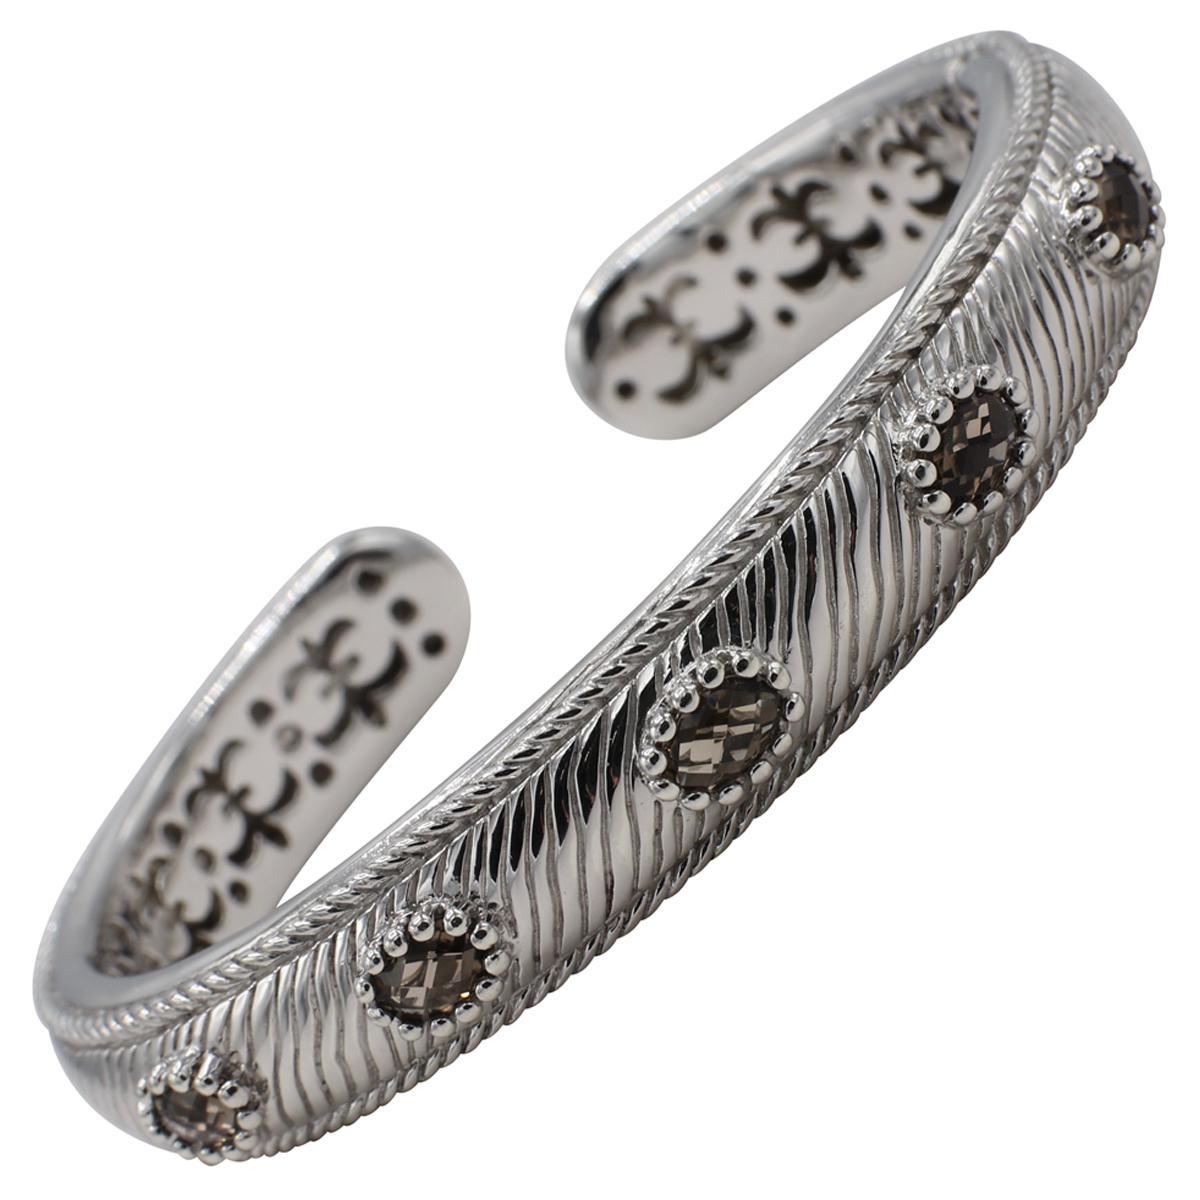 Judith Ripka Sterling Silver Smoky Quartz Bangle Cuff Bracelet